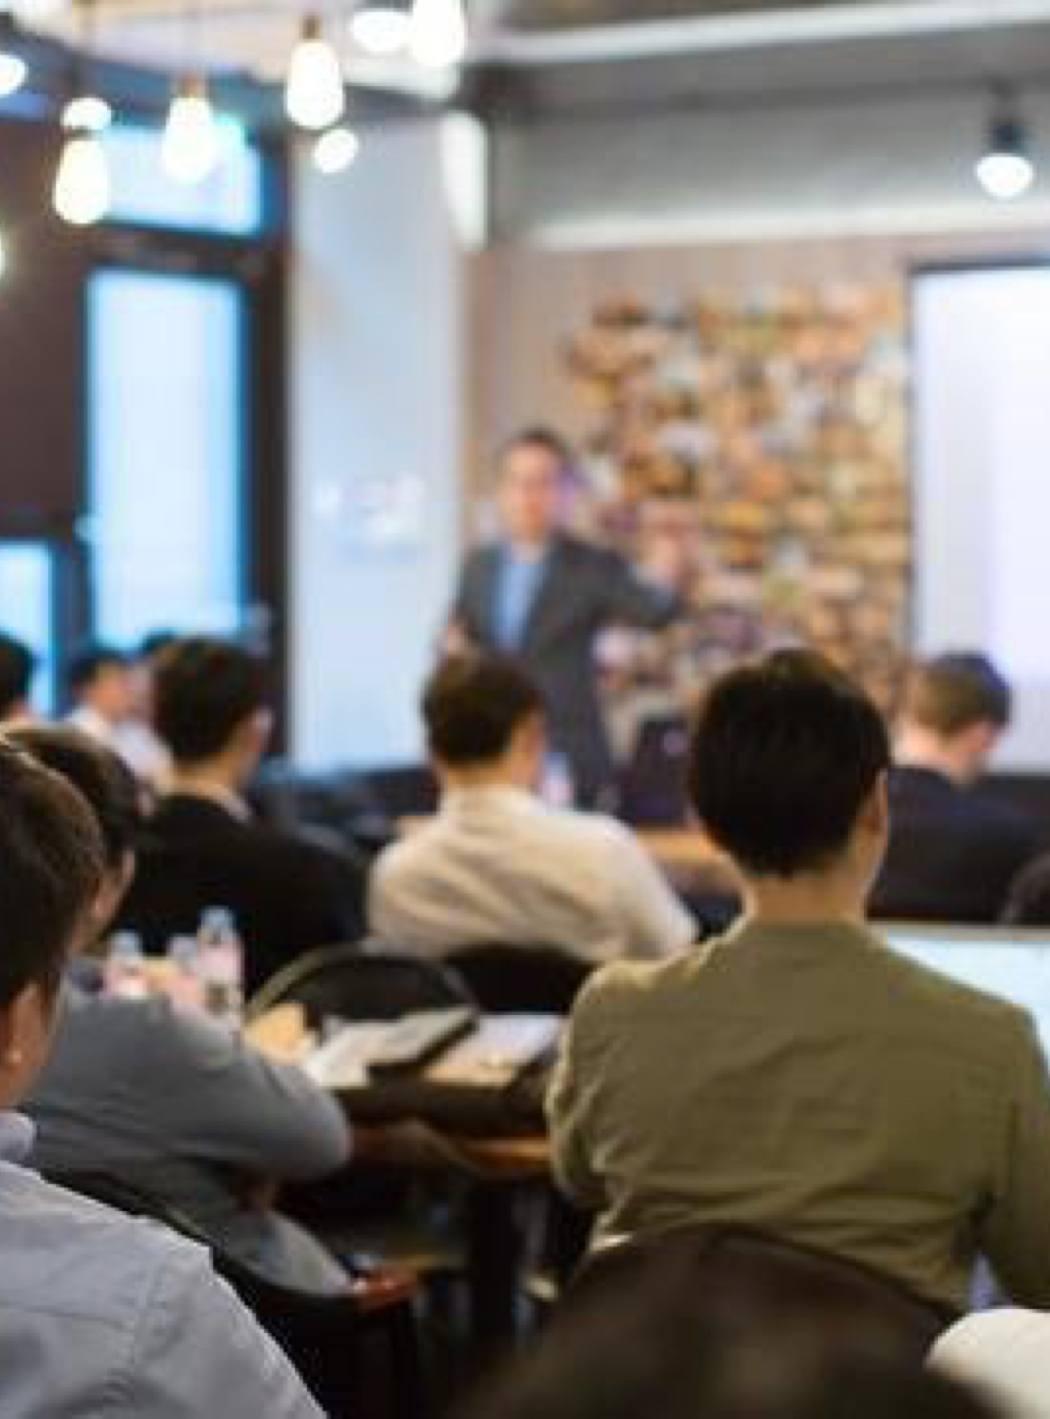 District of Columbia Law Firm Events & Seminars - Antonoplos & Associates